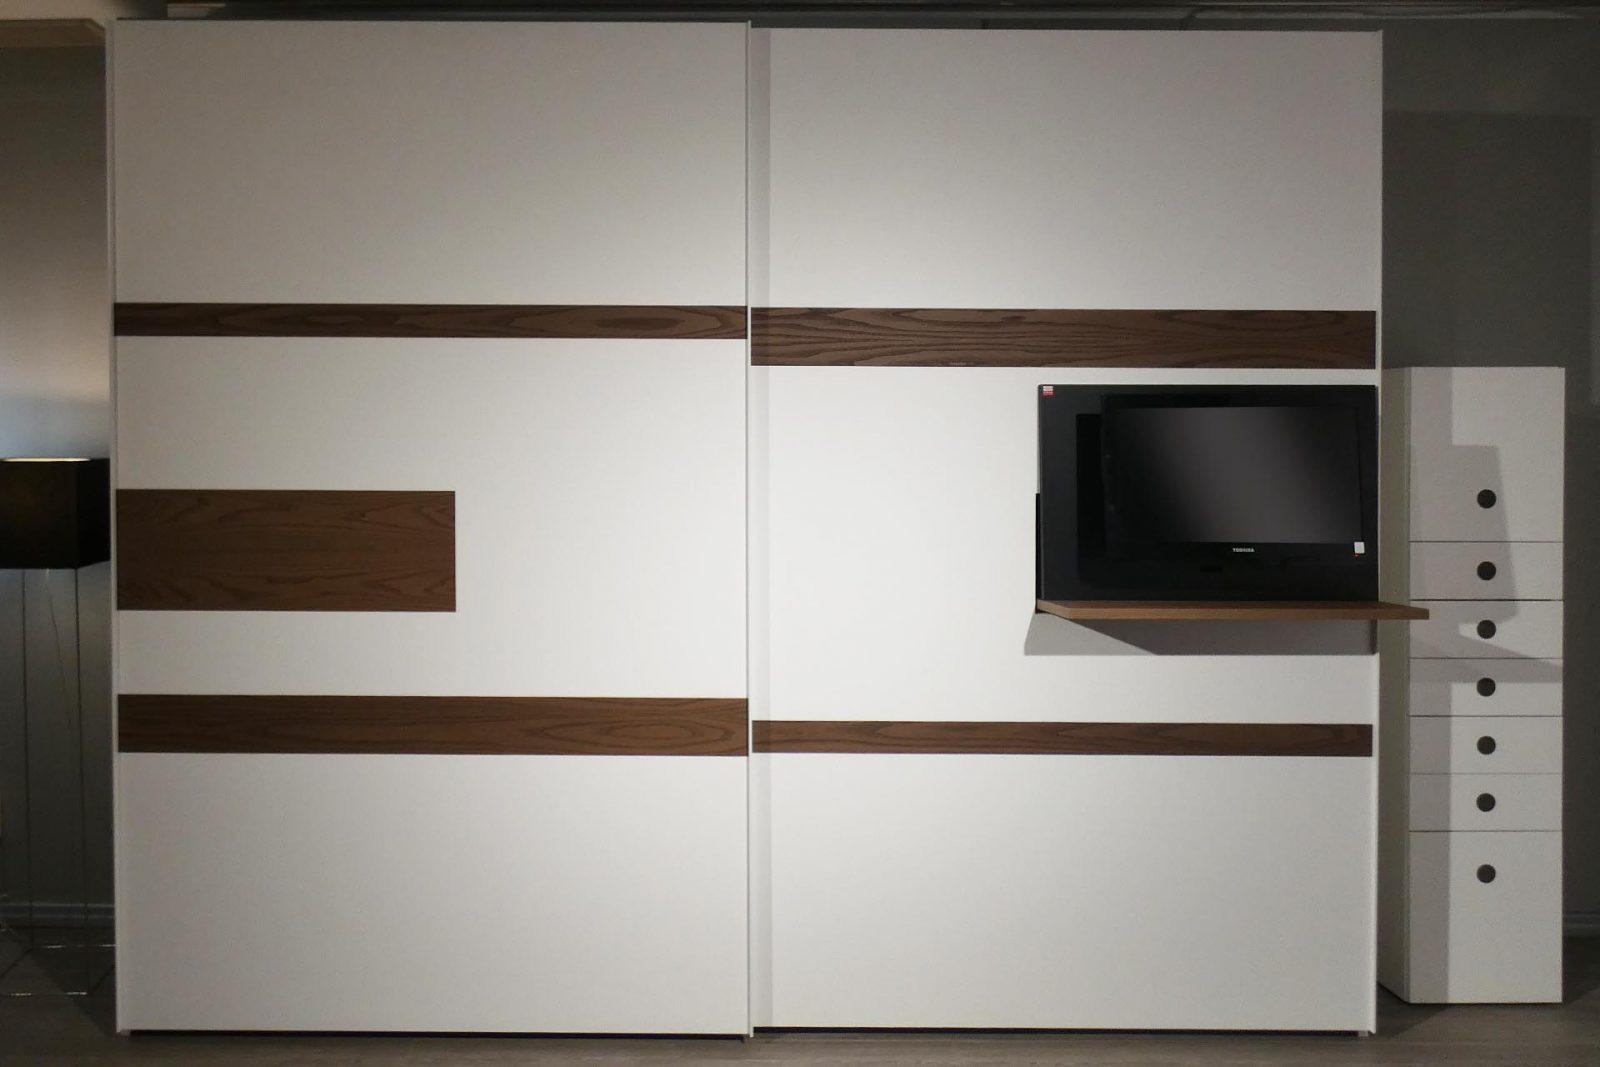 Armadio Con Porta Tv.Armadio Scorrevole Con Tv